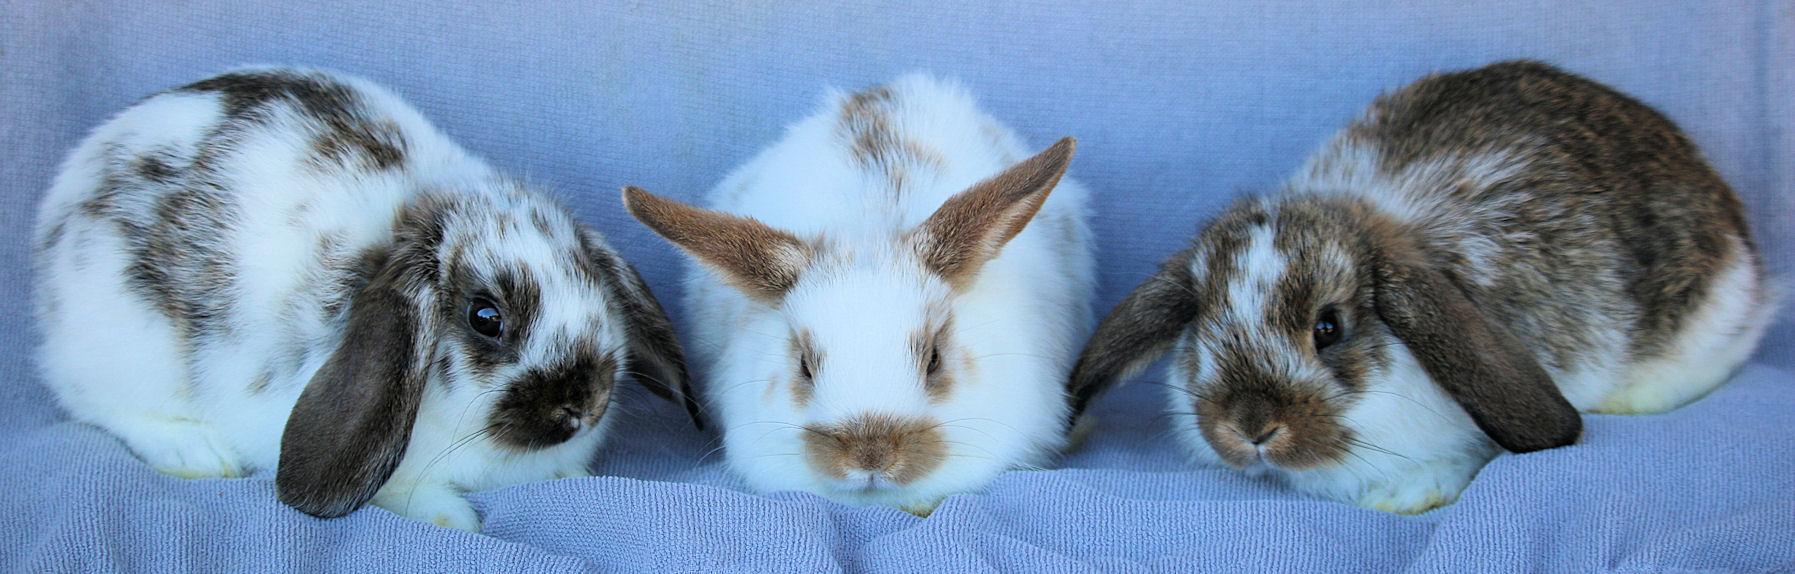 hl-buck-bunnies